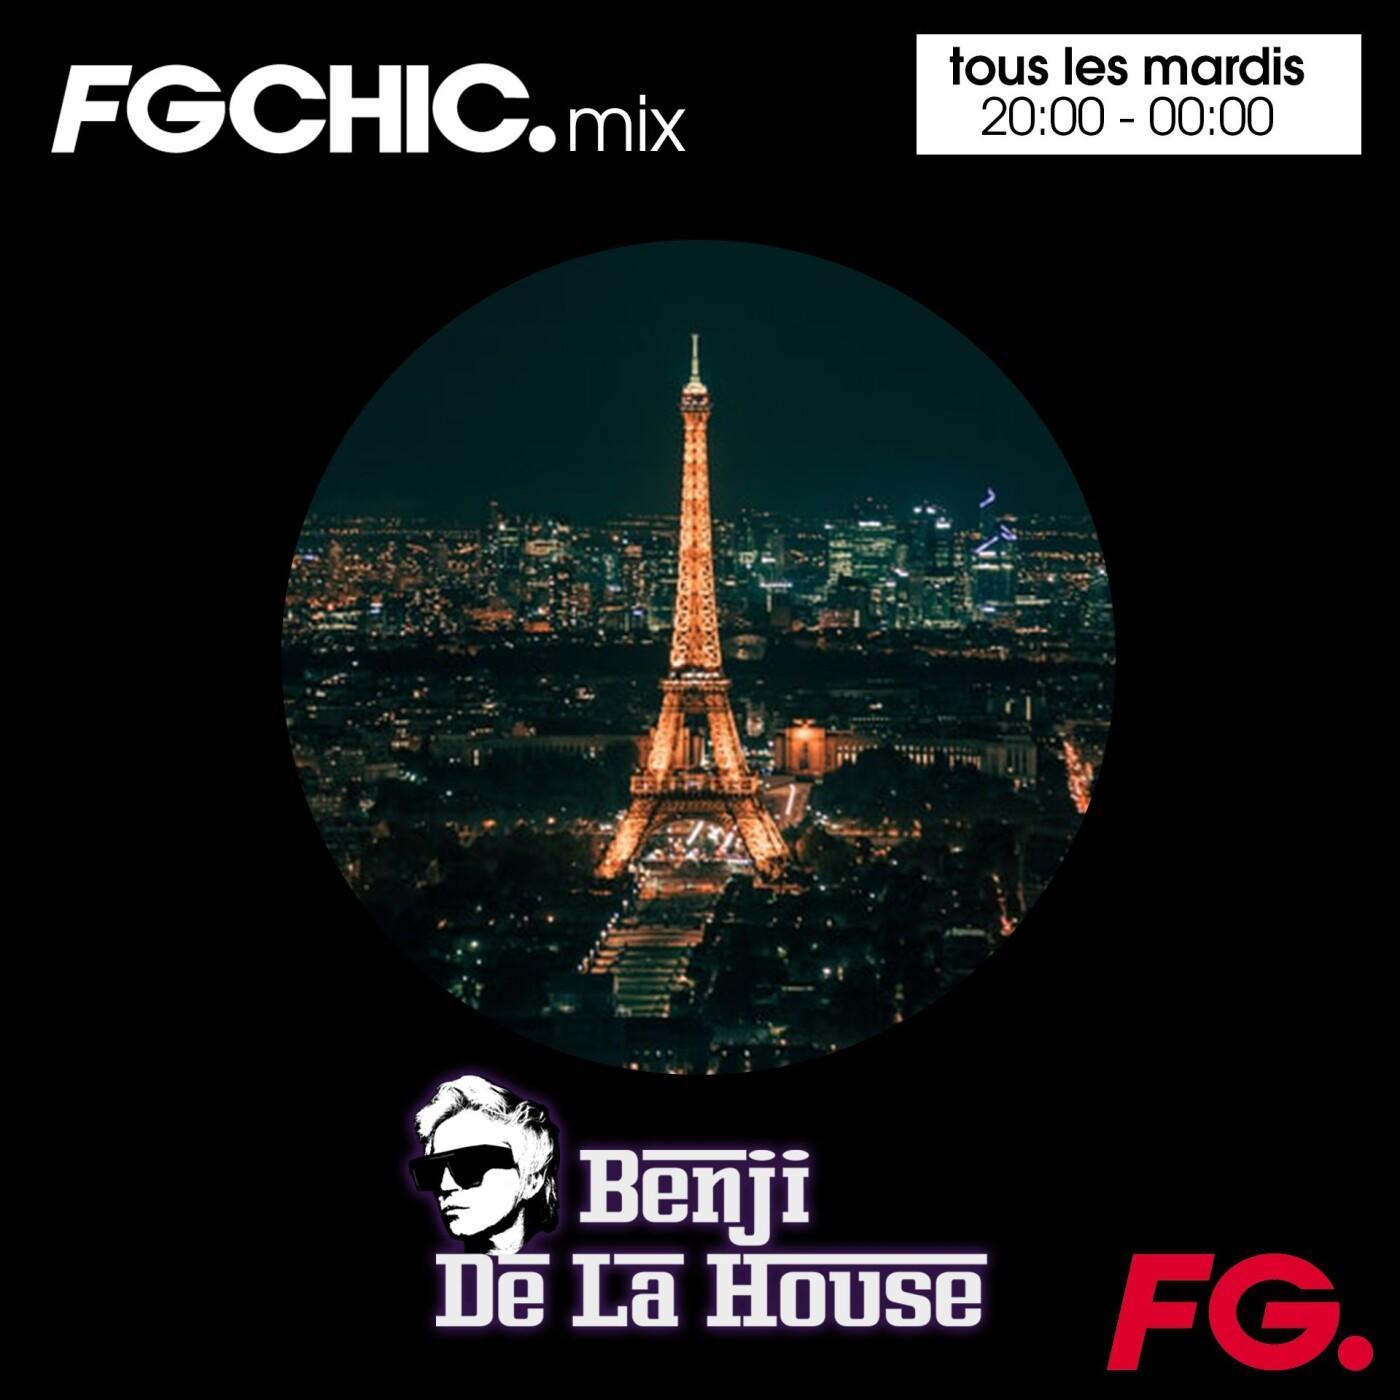 FG CHIC MIX : BENJI DE LA HOUSE